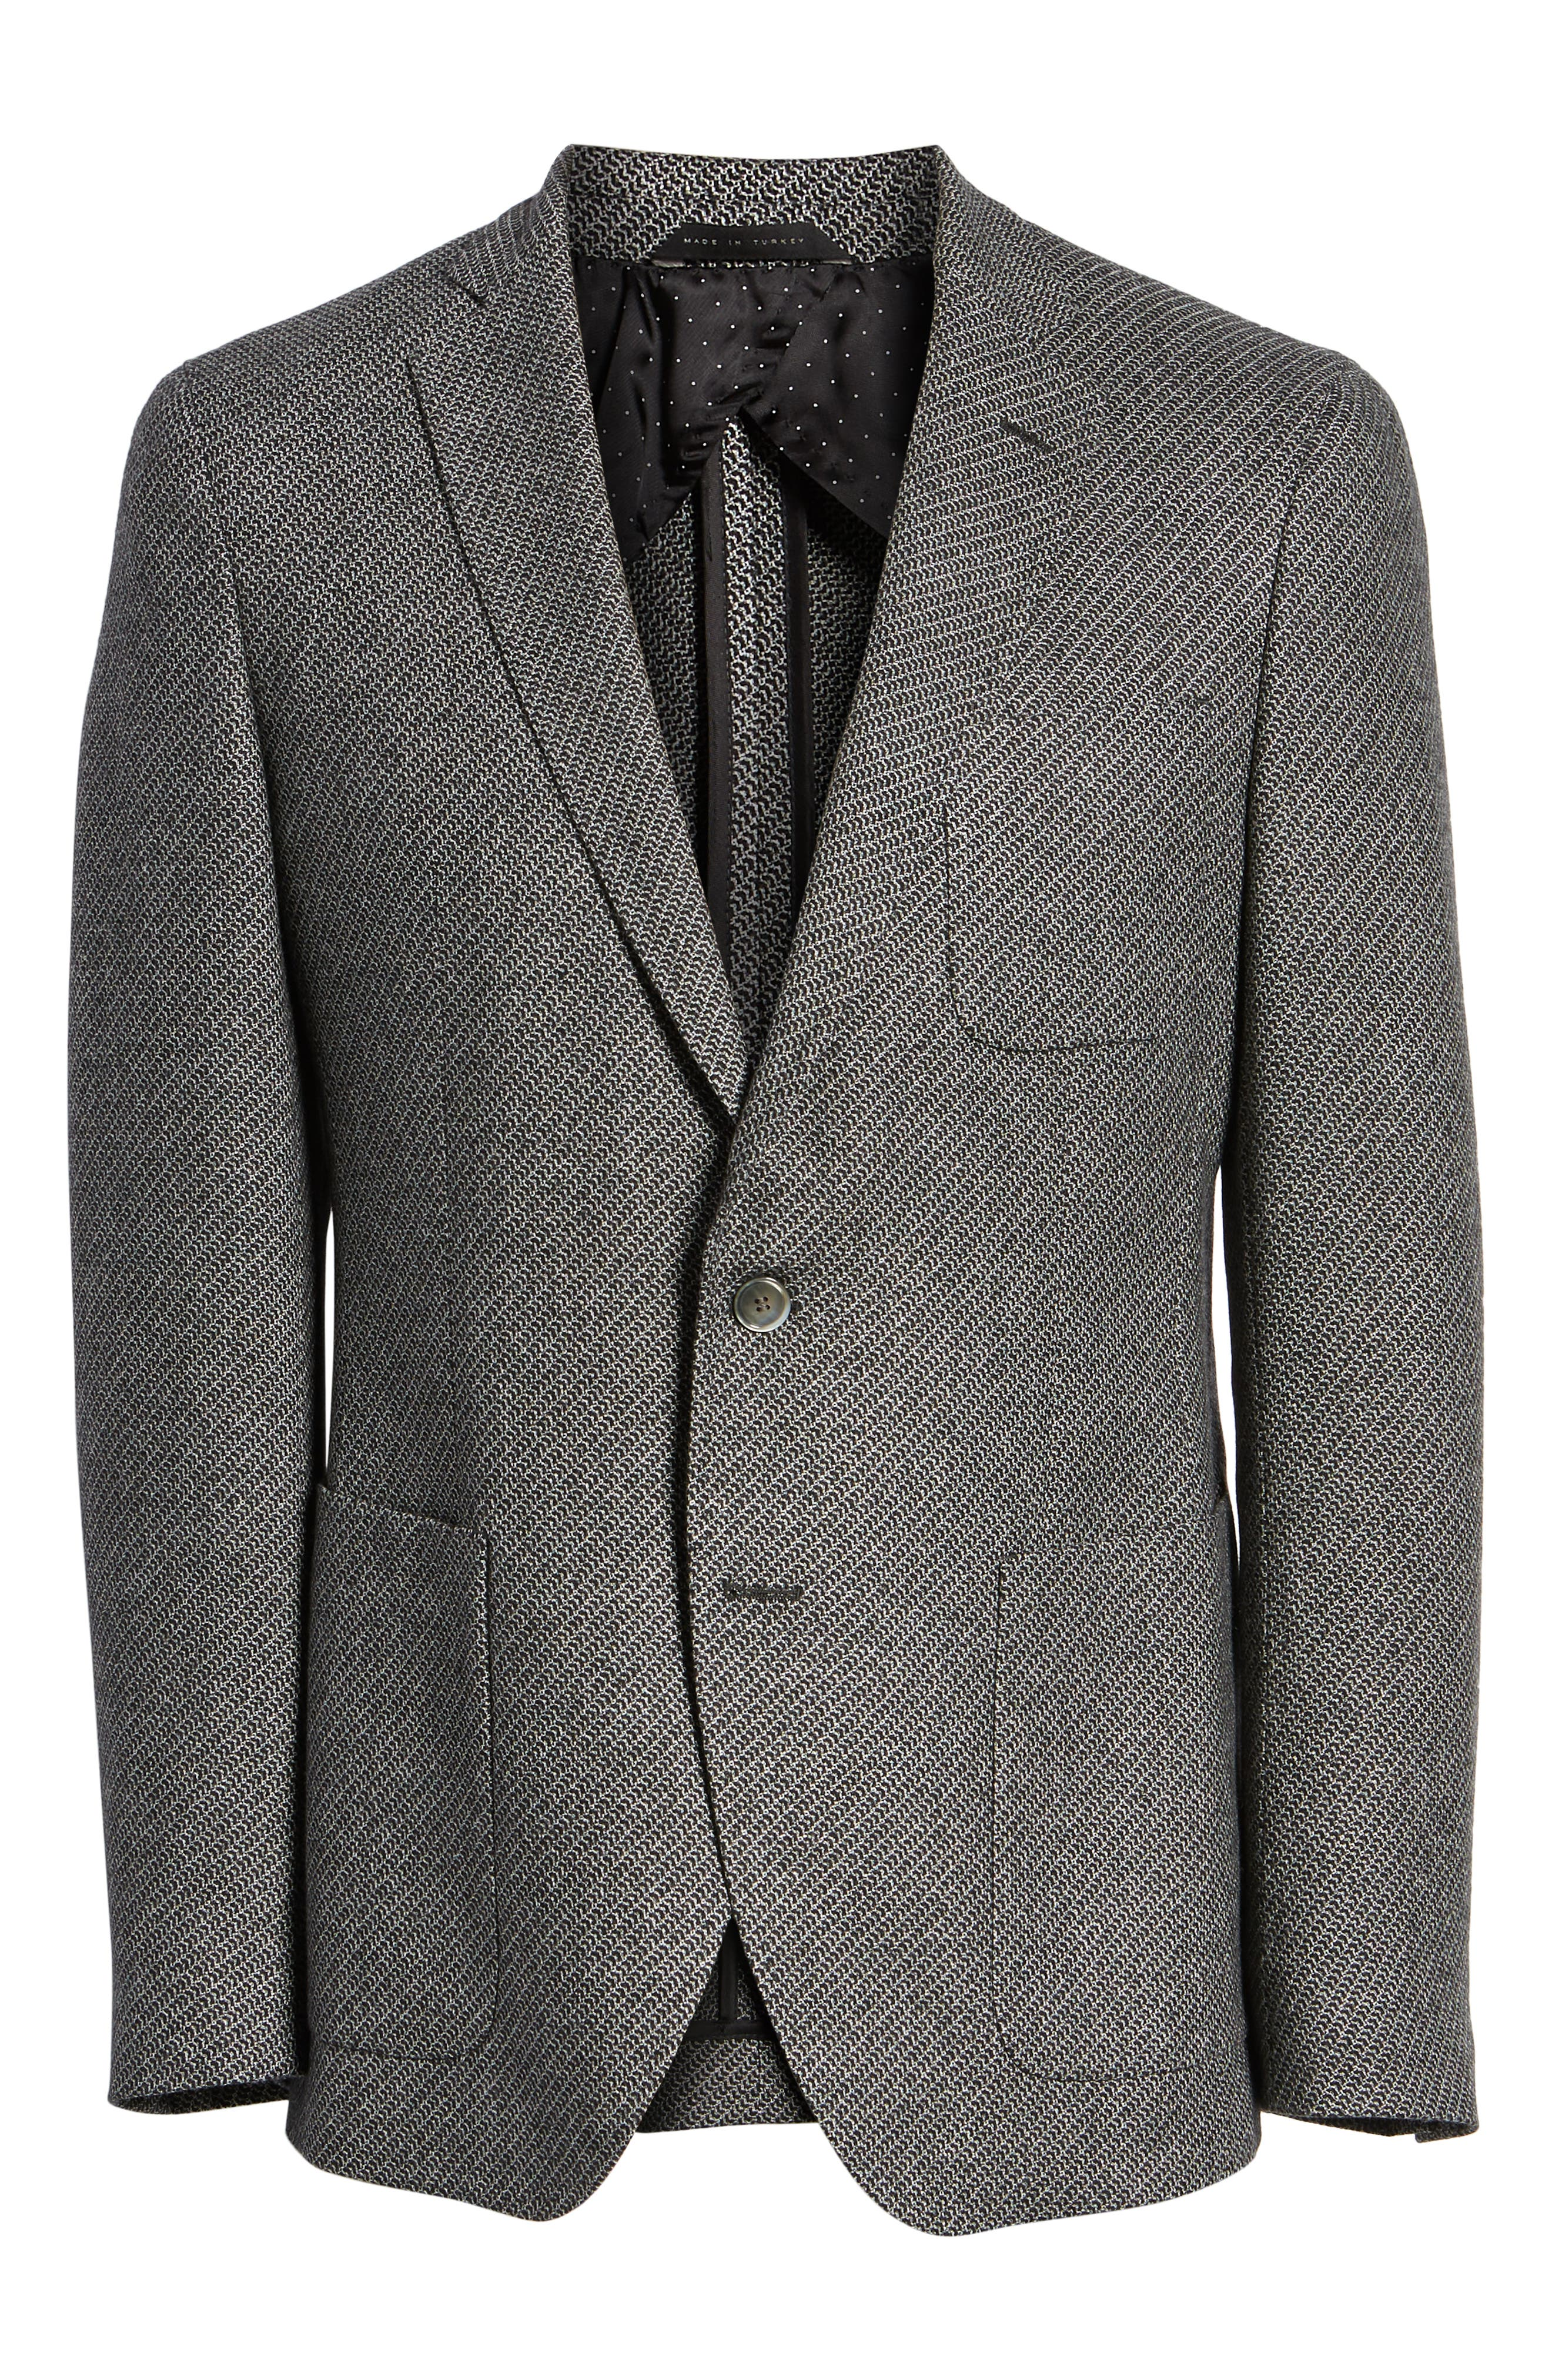 BOSS,                             Raye Extra Trim Fit Wool Blend Sport Coat,                             Alternate thumbnail 5, color,                             DARK GREY